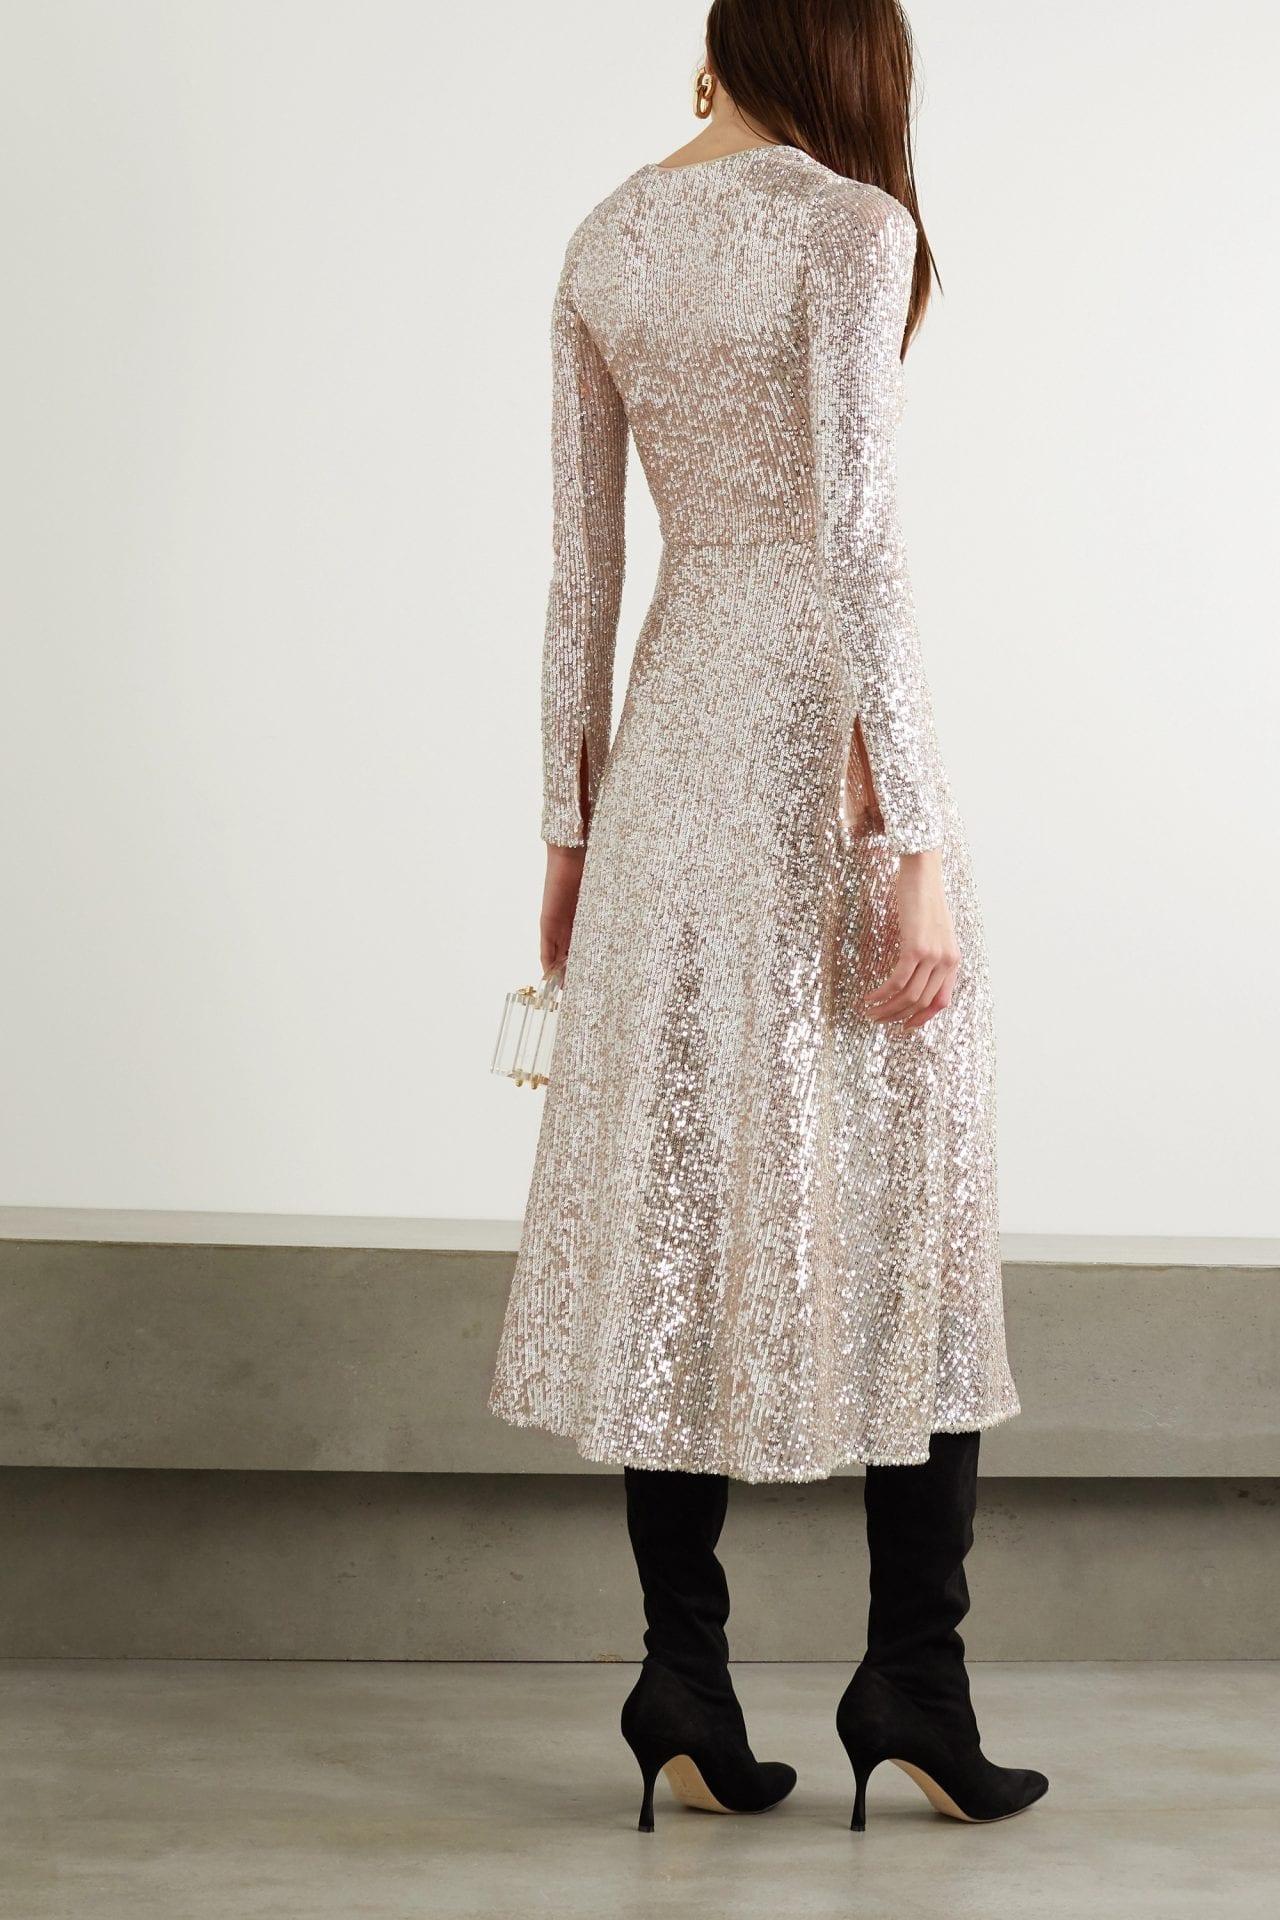 ROTATE BIRGER CHRISTENSEN Sierra Ruched Sequined Stretch-knit Midi Dress